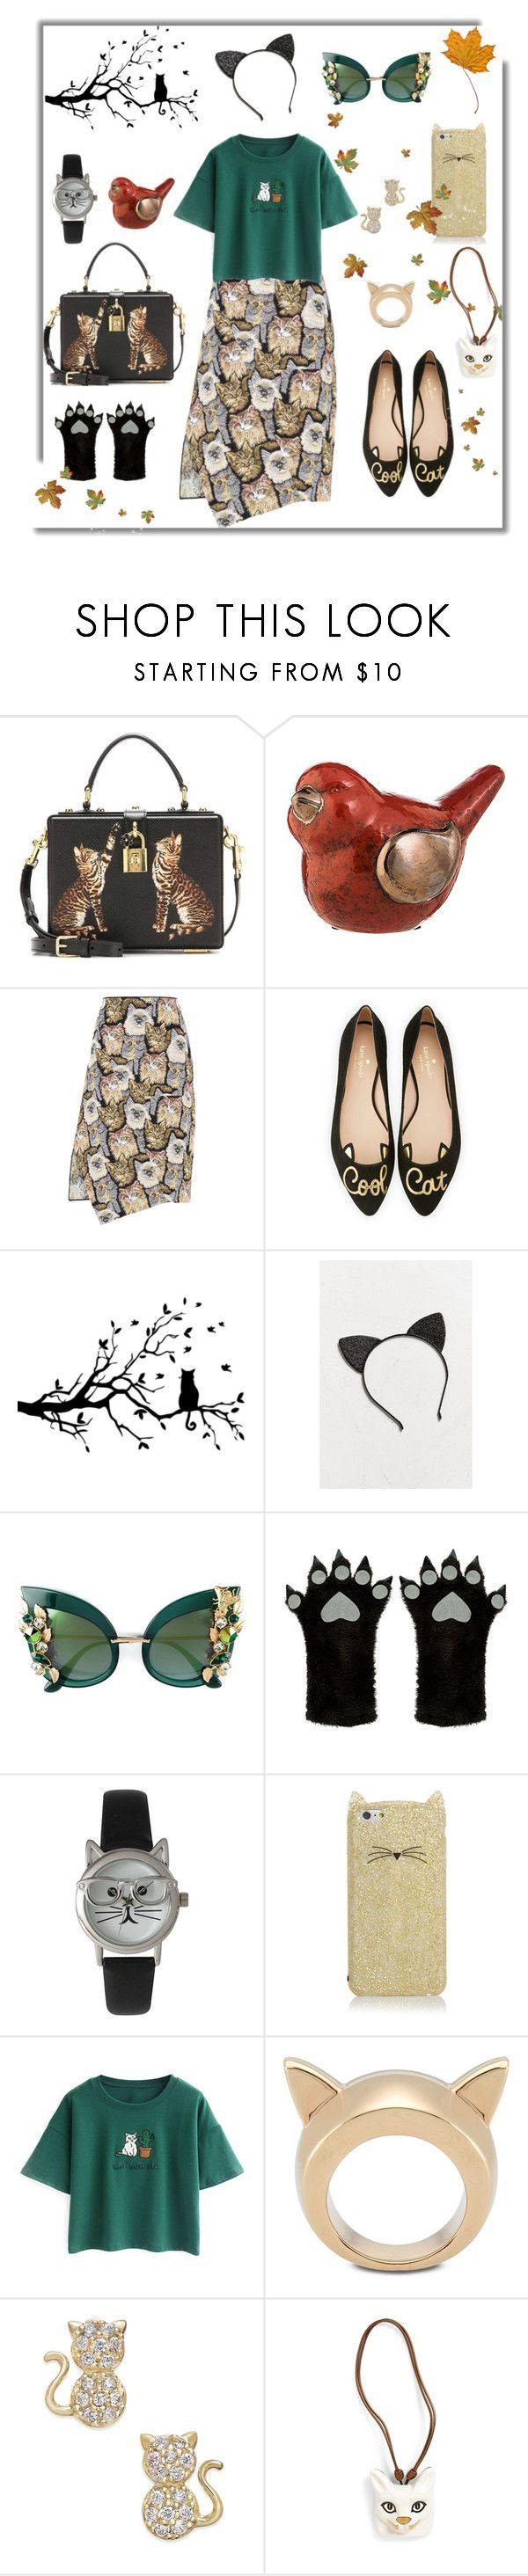 """Cat look😸"" by dilka-ylibka on Polyvore featuring мода, Dolce&Gabbana, Evergreen, STELLA McCARTNEY, Kate Spade, Urban Outfitters, Accessorize, Olivia Pratt, Chicnova Fashion и Loewe"